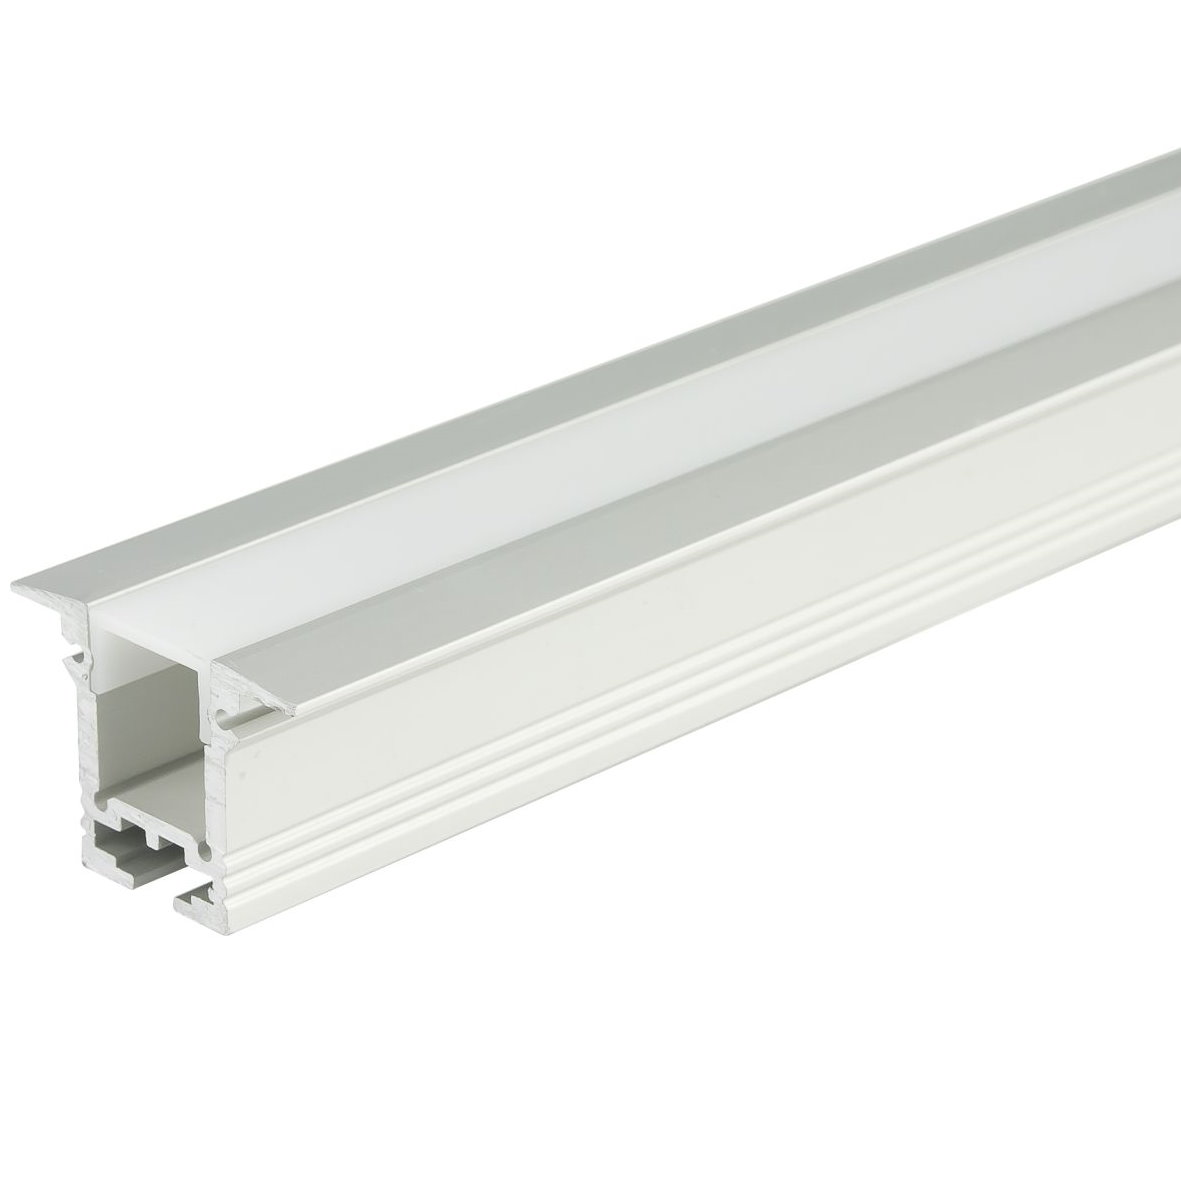 19 9 m led aluminium profil aluprofil abdeckung eloxiert strip lichtband ebay. Black Bedroom Furniture Sets. Home Design Ideas